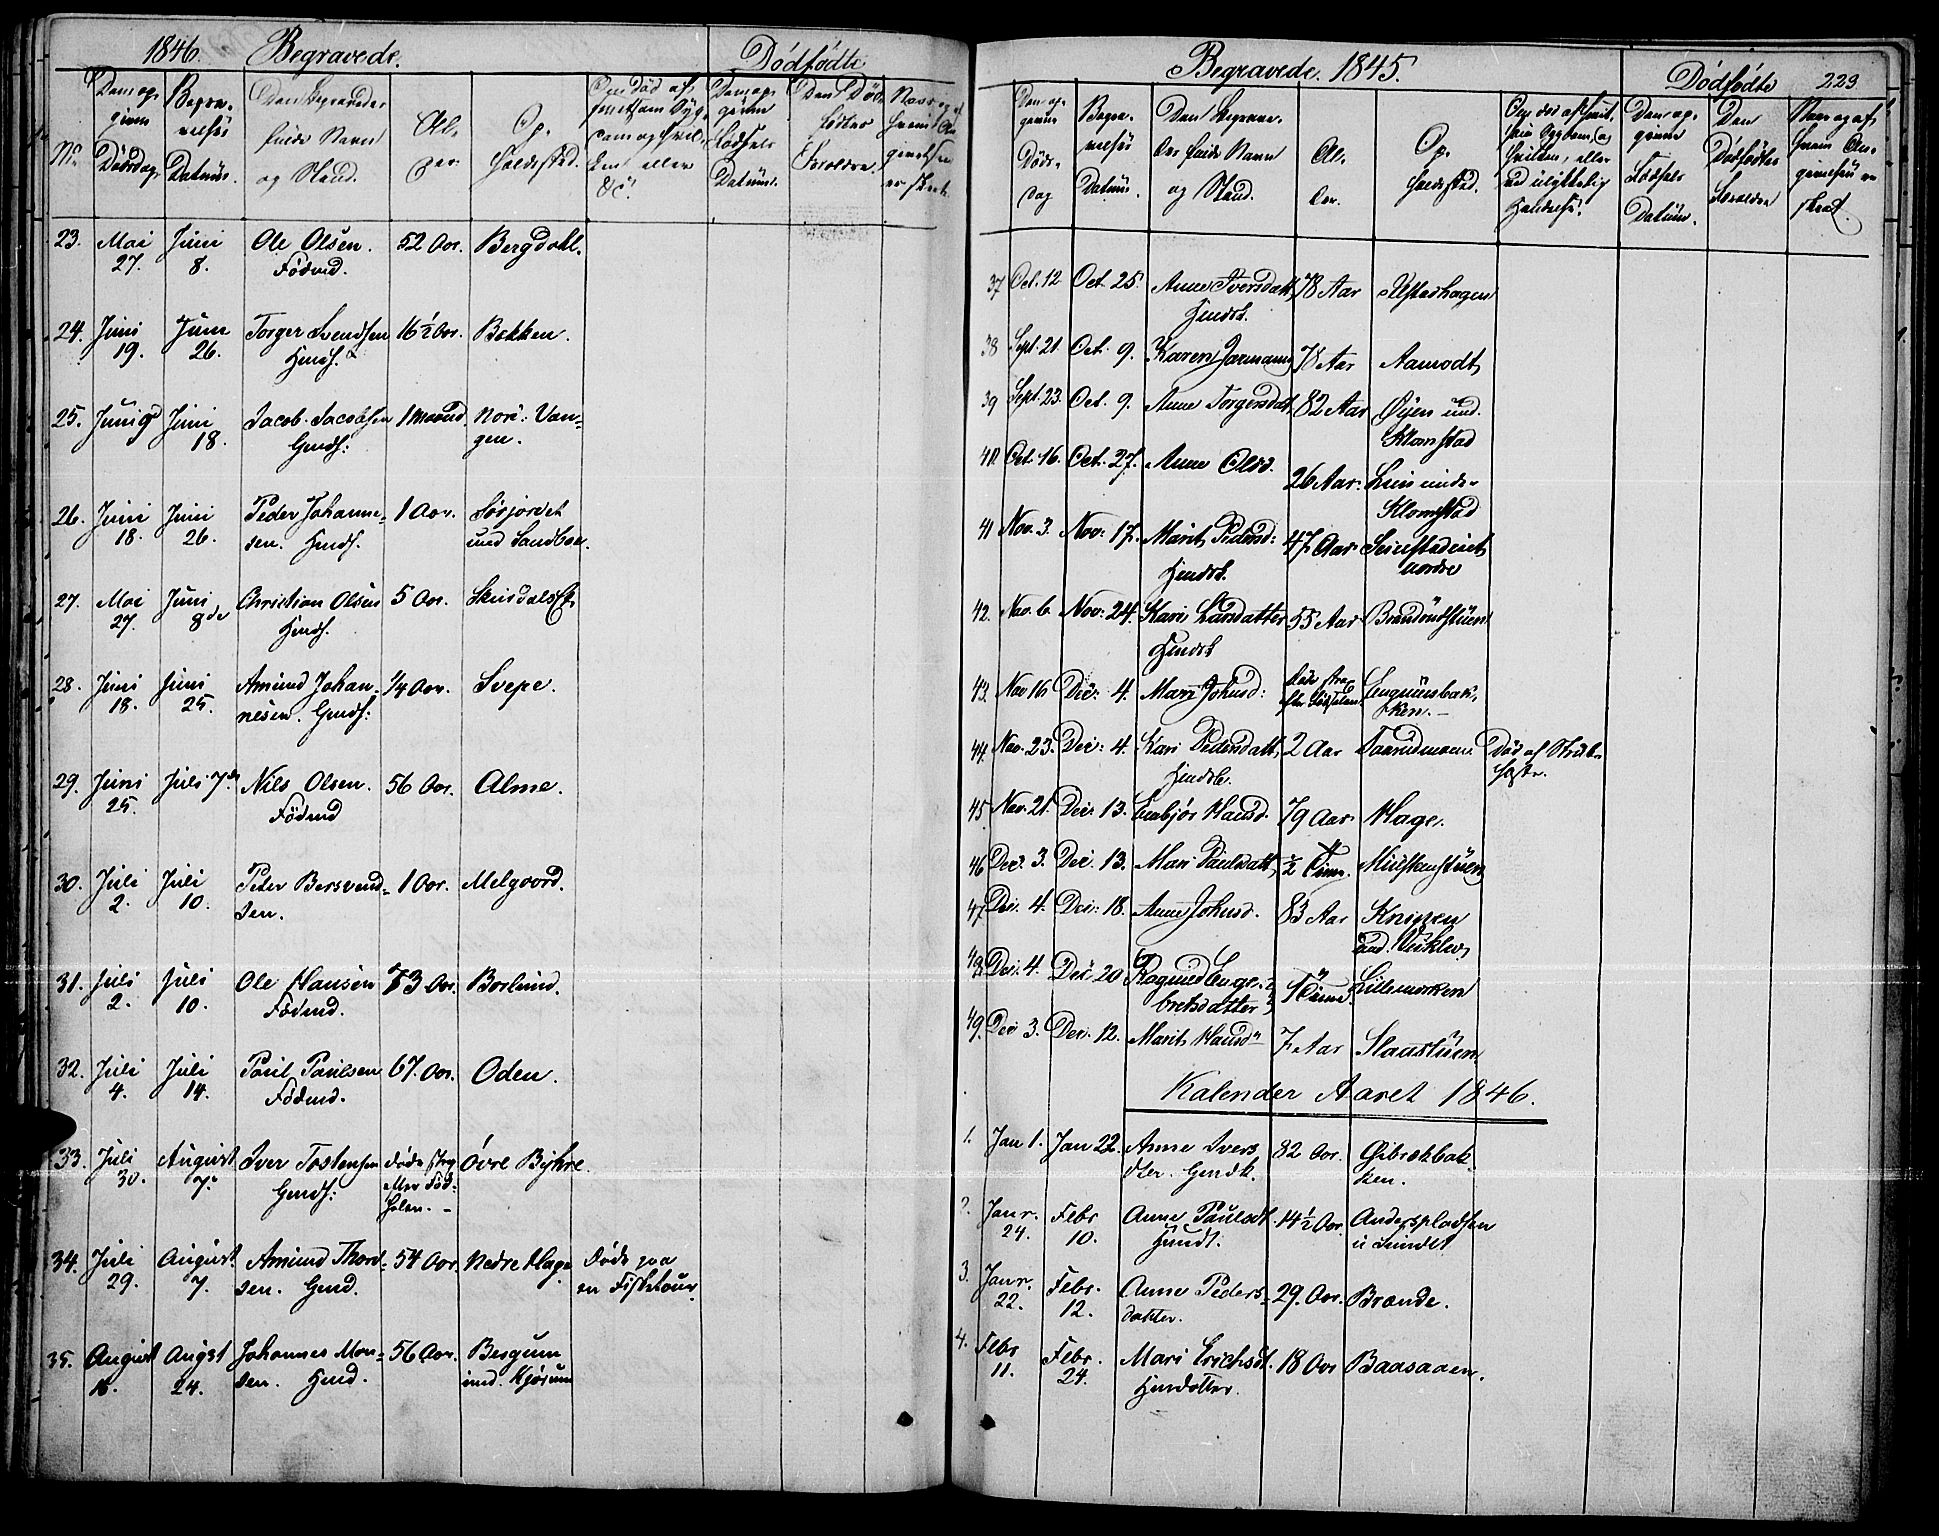 SAH, Fron prestekontor, H/Ha/Haa/L0004: Ministerialbok nr. 4, 1839-1848, s. 223